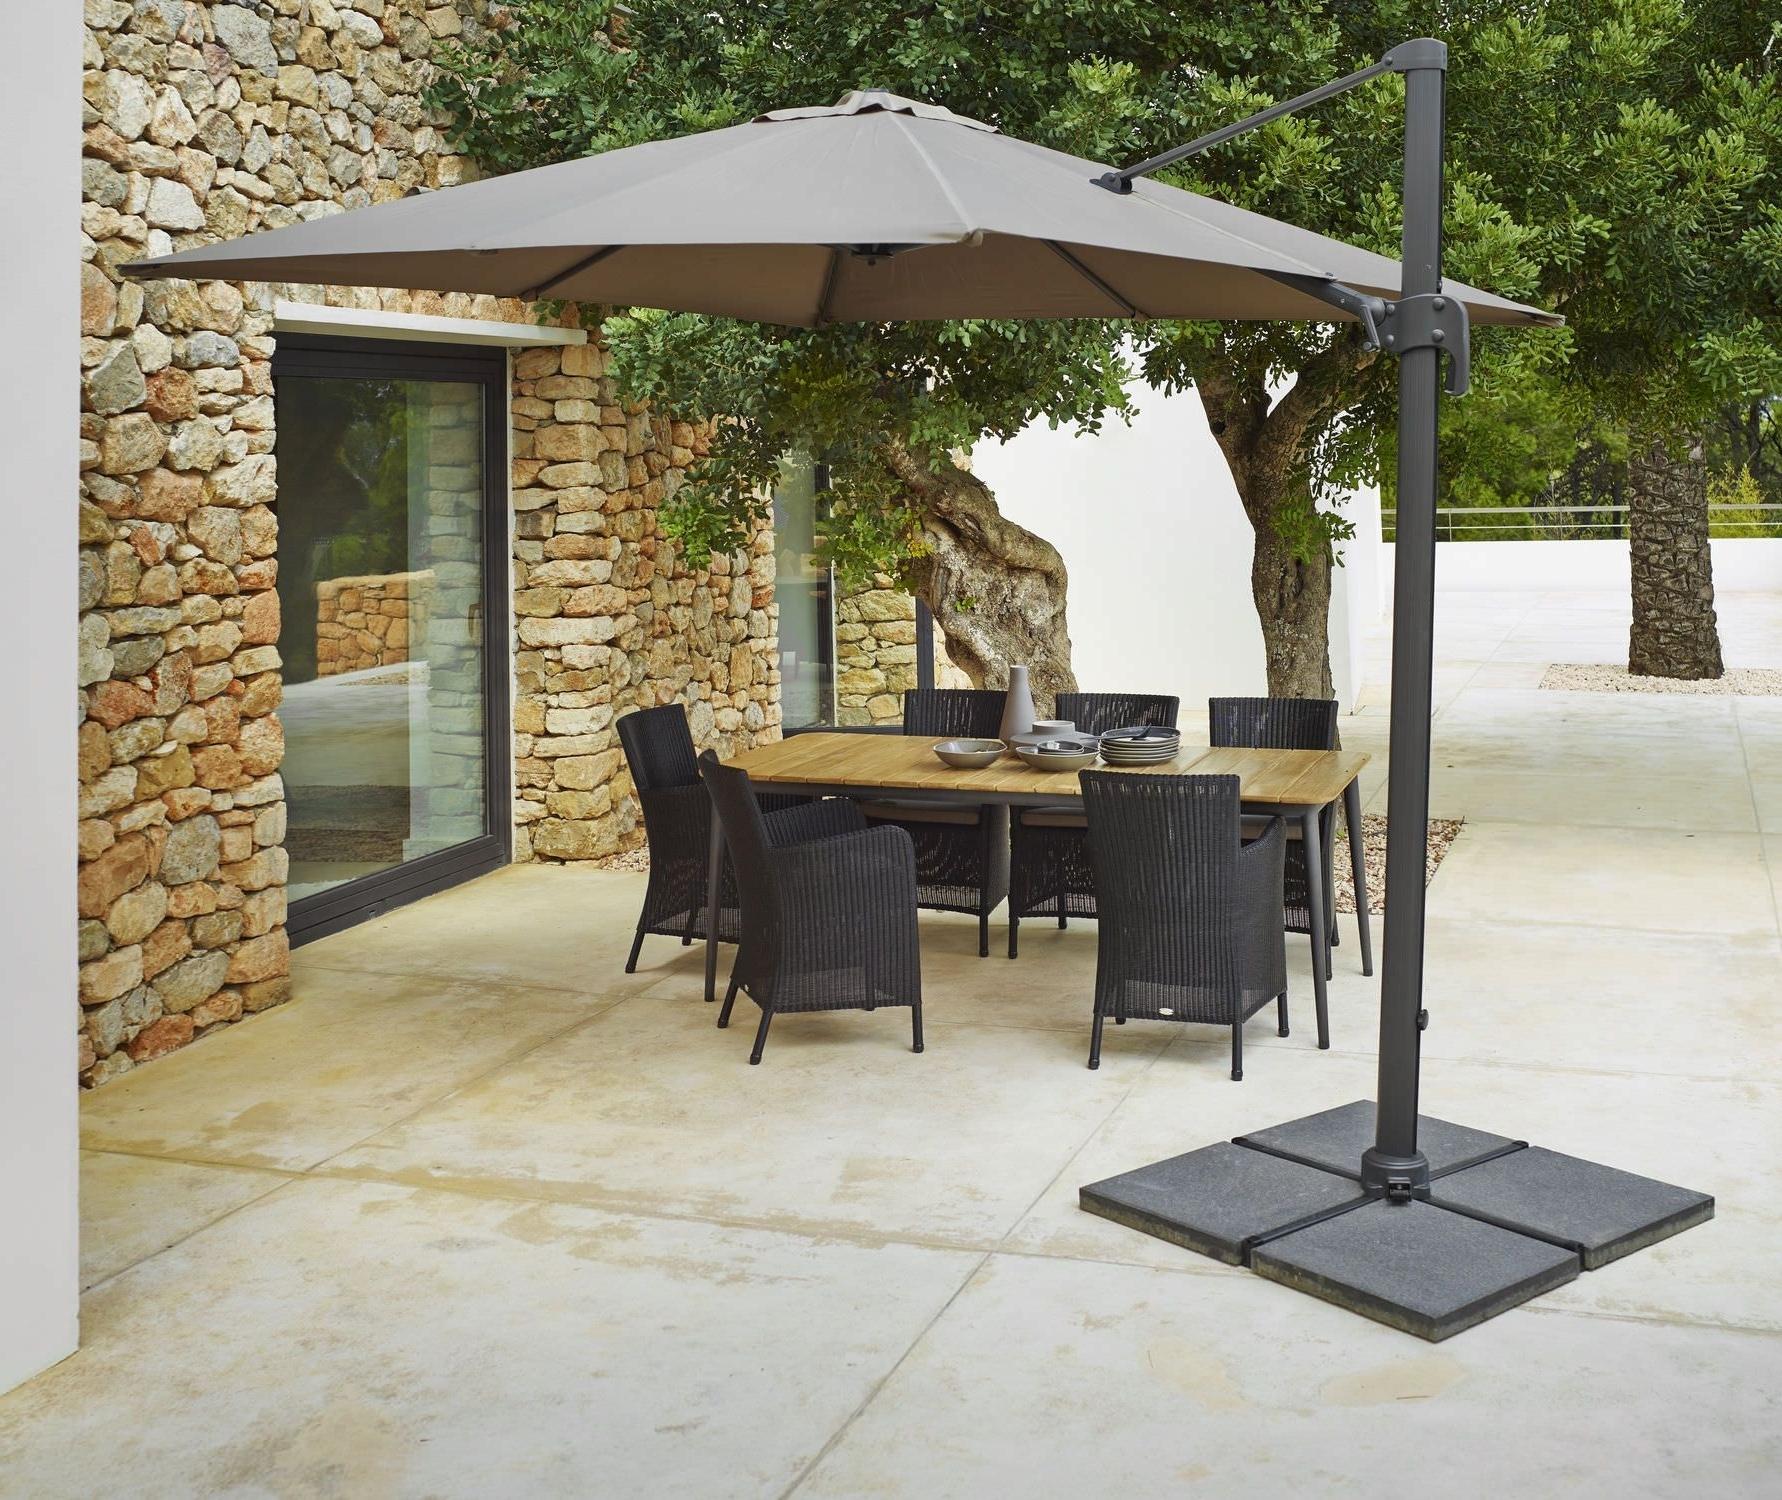 Patio Idea Intended For Rectangular Offset Patio Umbrellas (View 3 of 20)